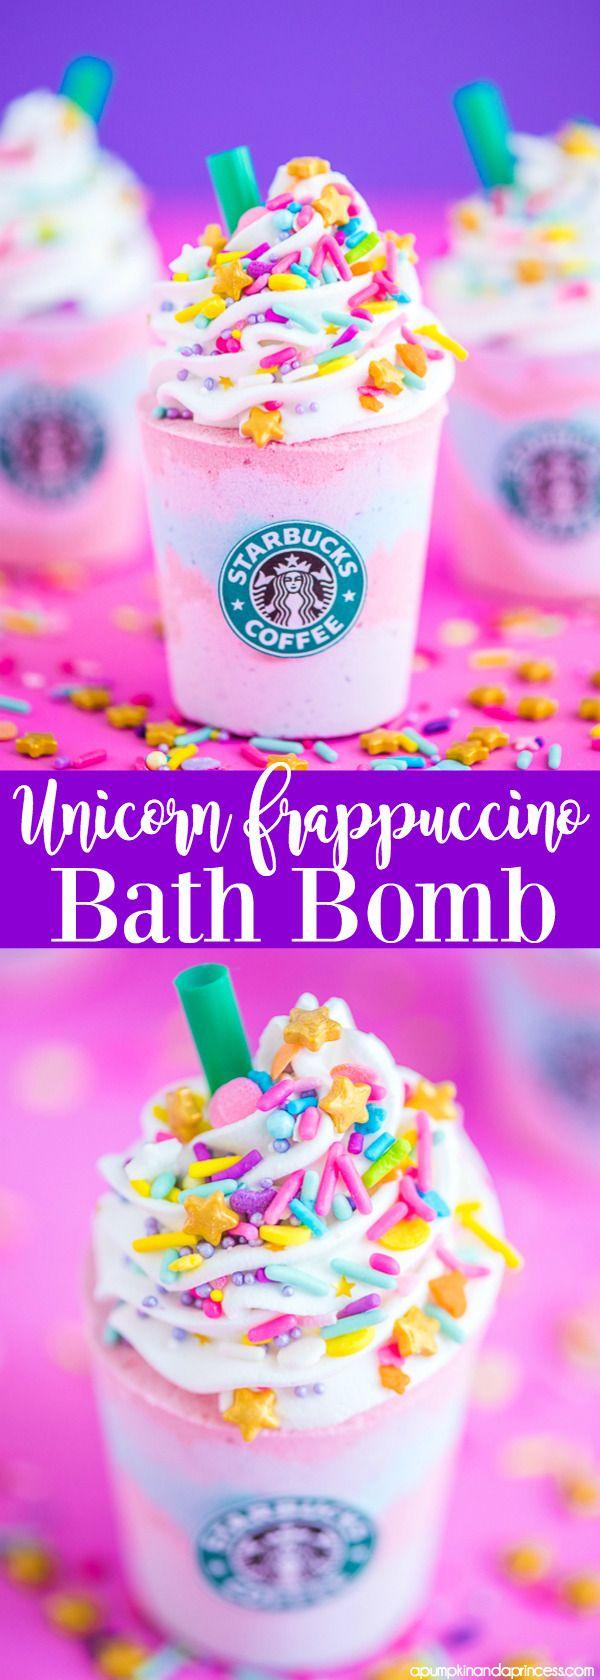 DIY Unicron Frappuccino Bath Bomb